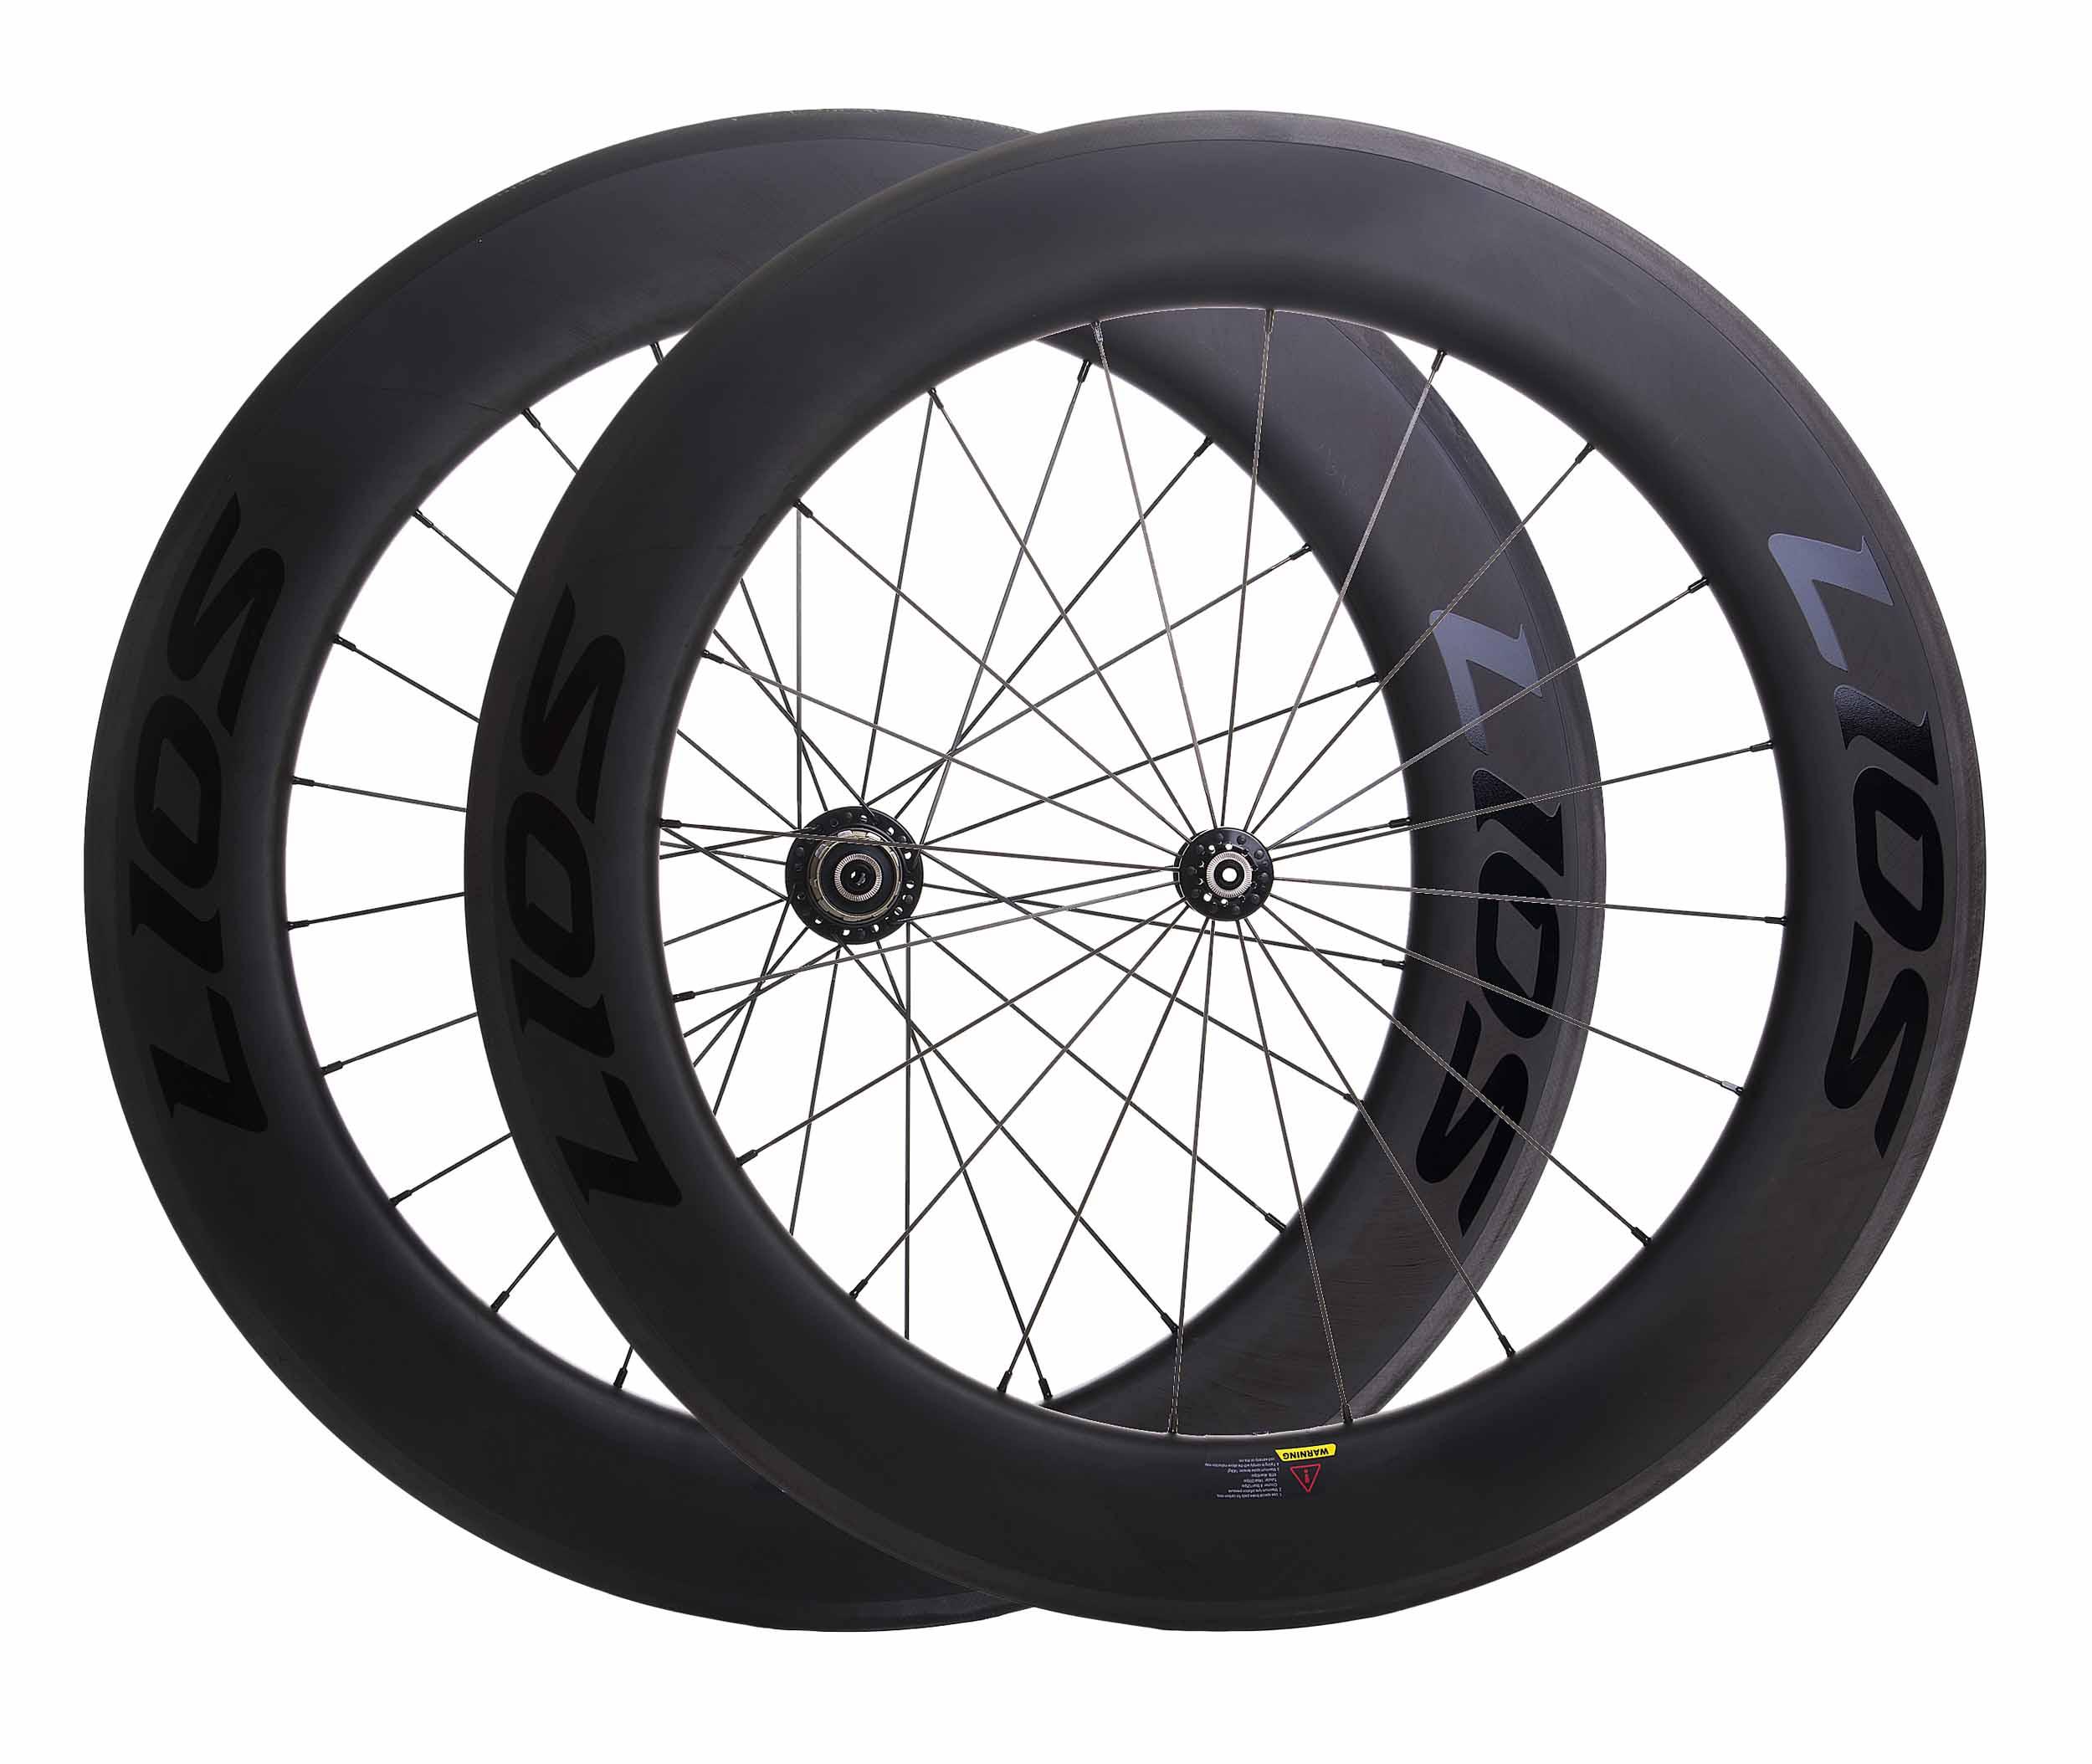 lios-c80-carbon-wheelset-black-image-1.jpg